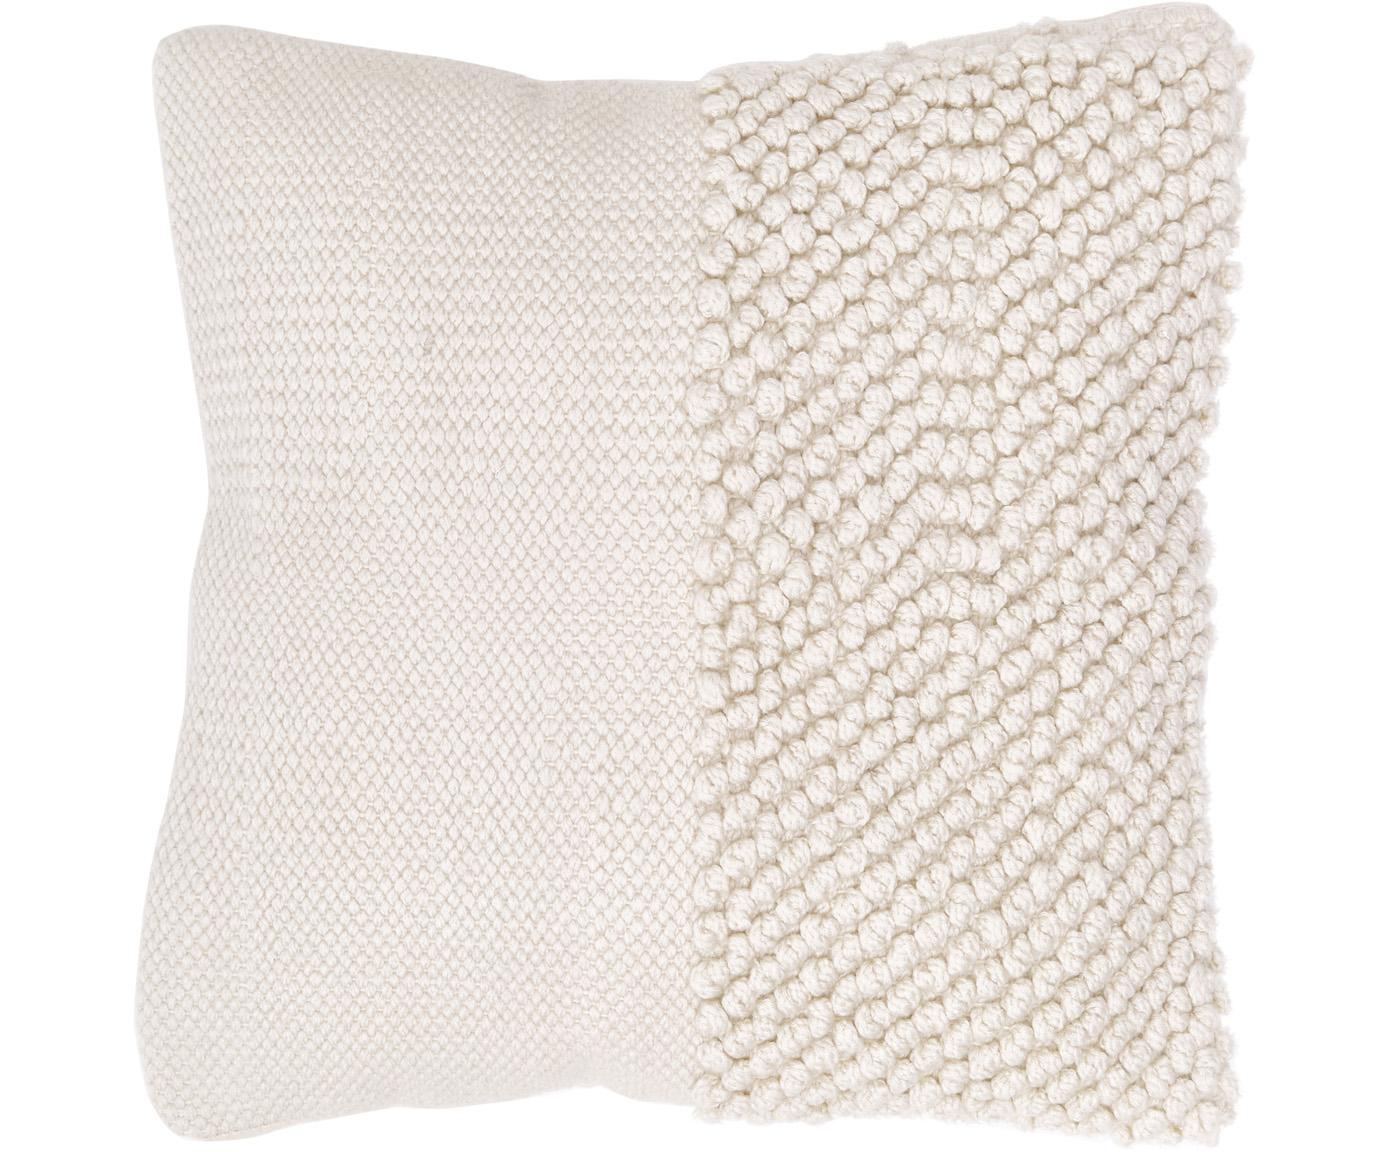 Funda de cojín Andi, 80%acrílico, 20%algodón, Blanco crema, dorado, Cama 180/200 cm (270 x 280 cm)